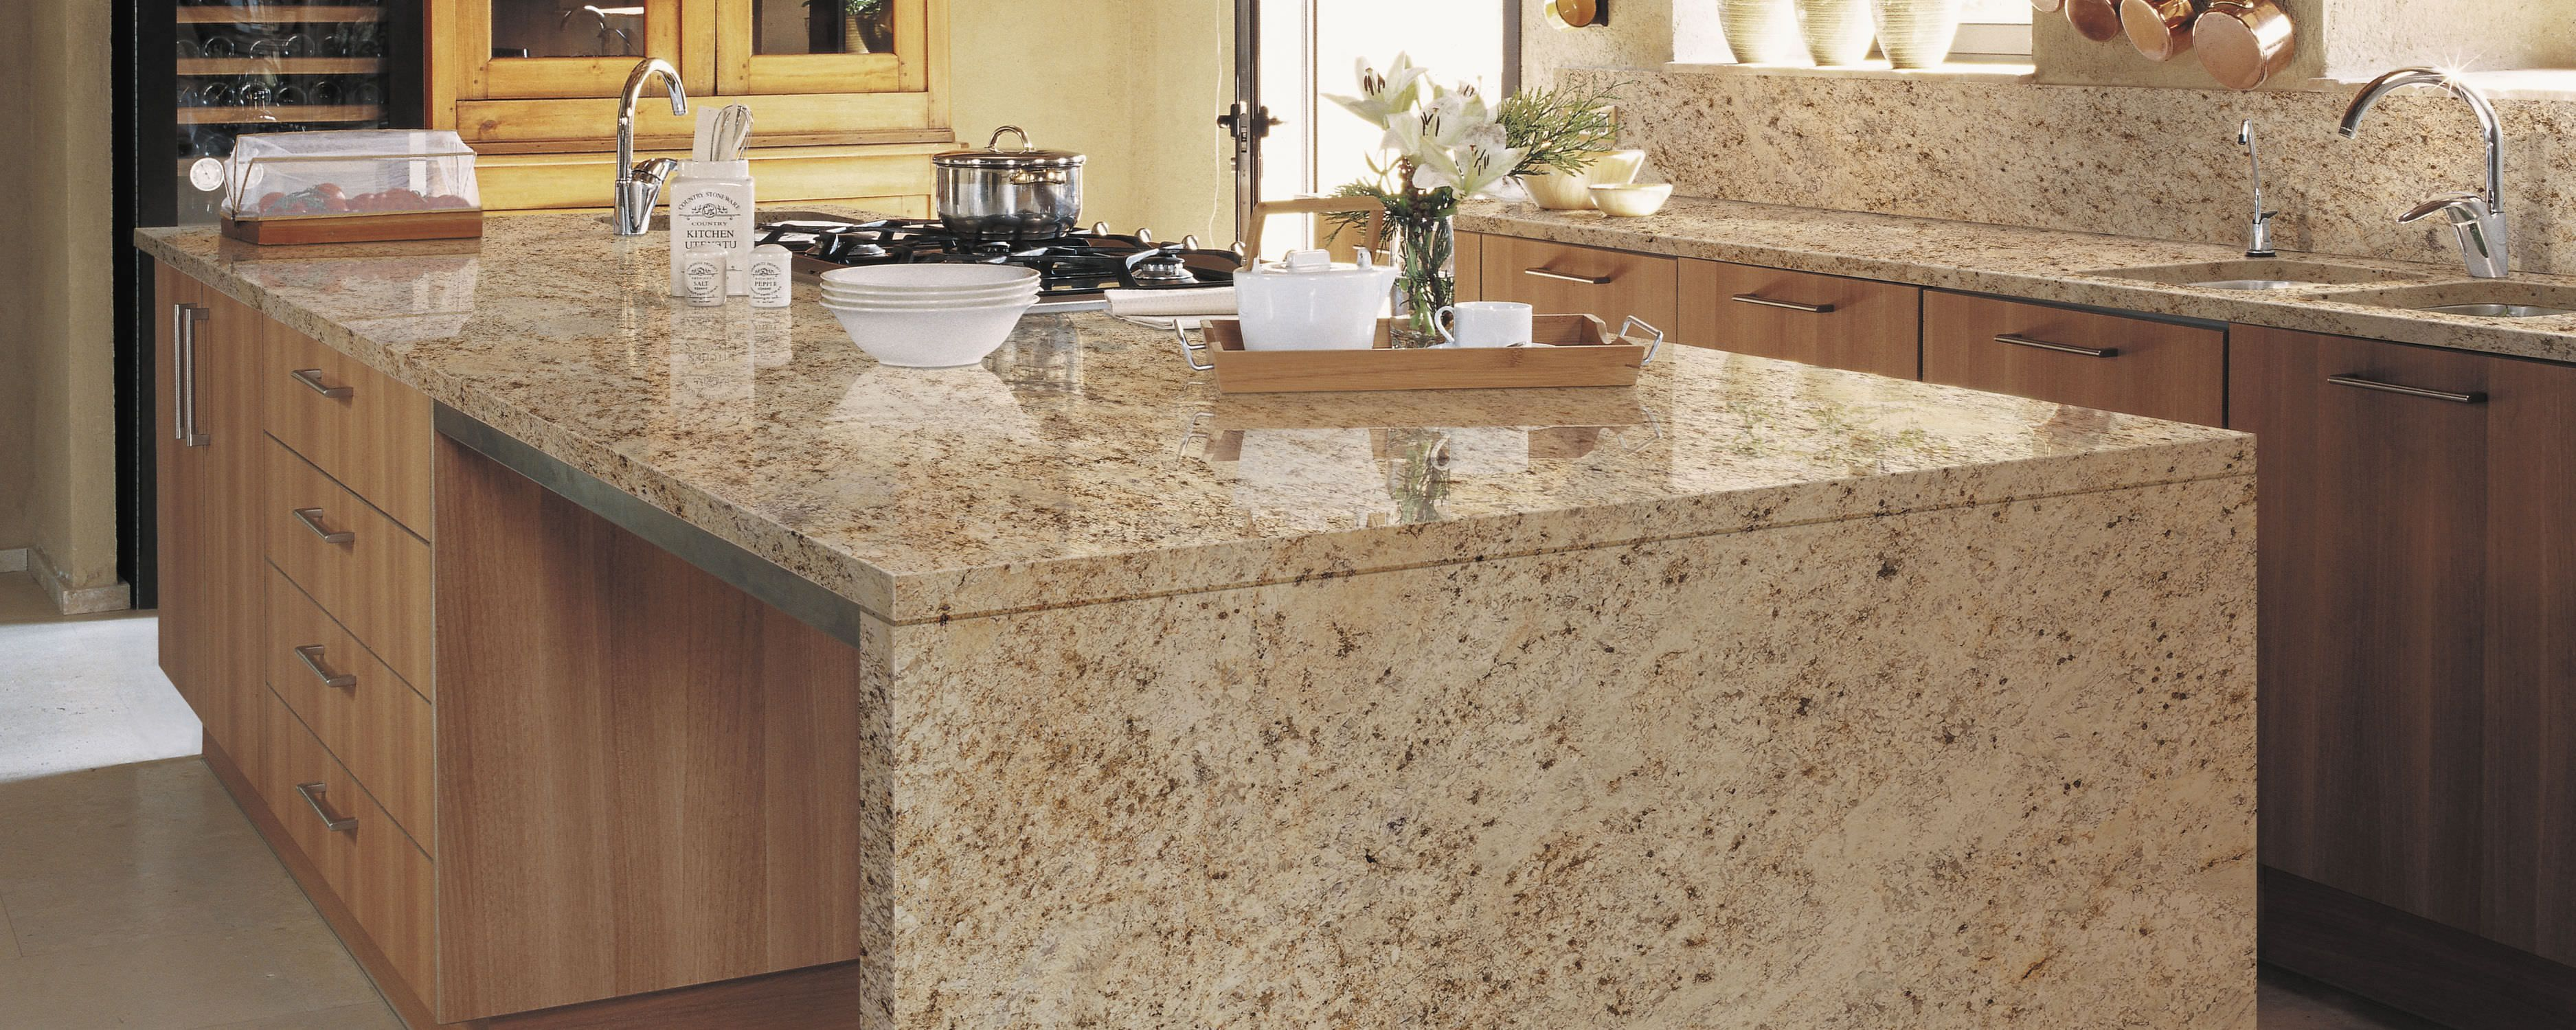 cubierta granito gold cocinas integrales mdul studio